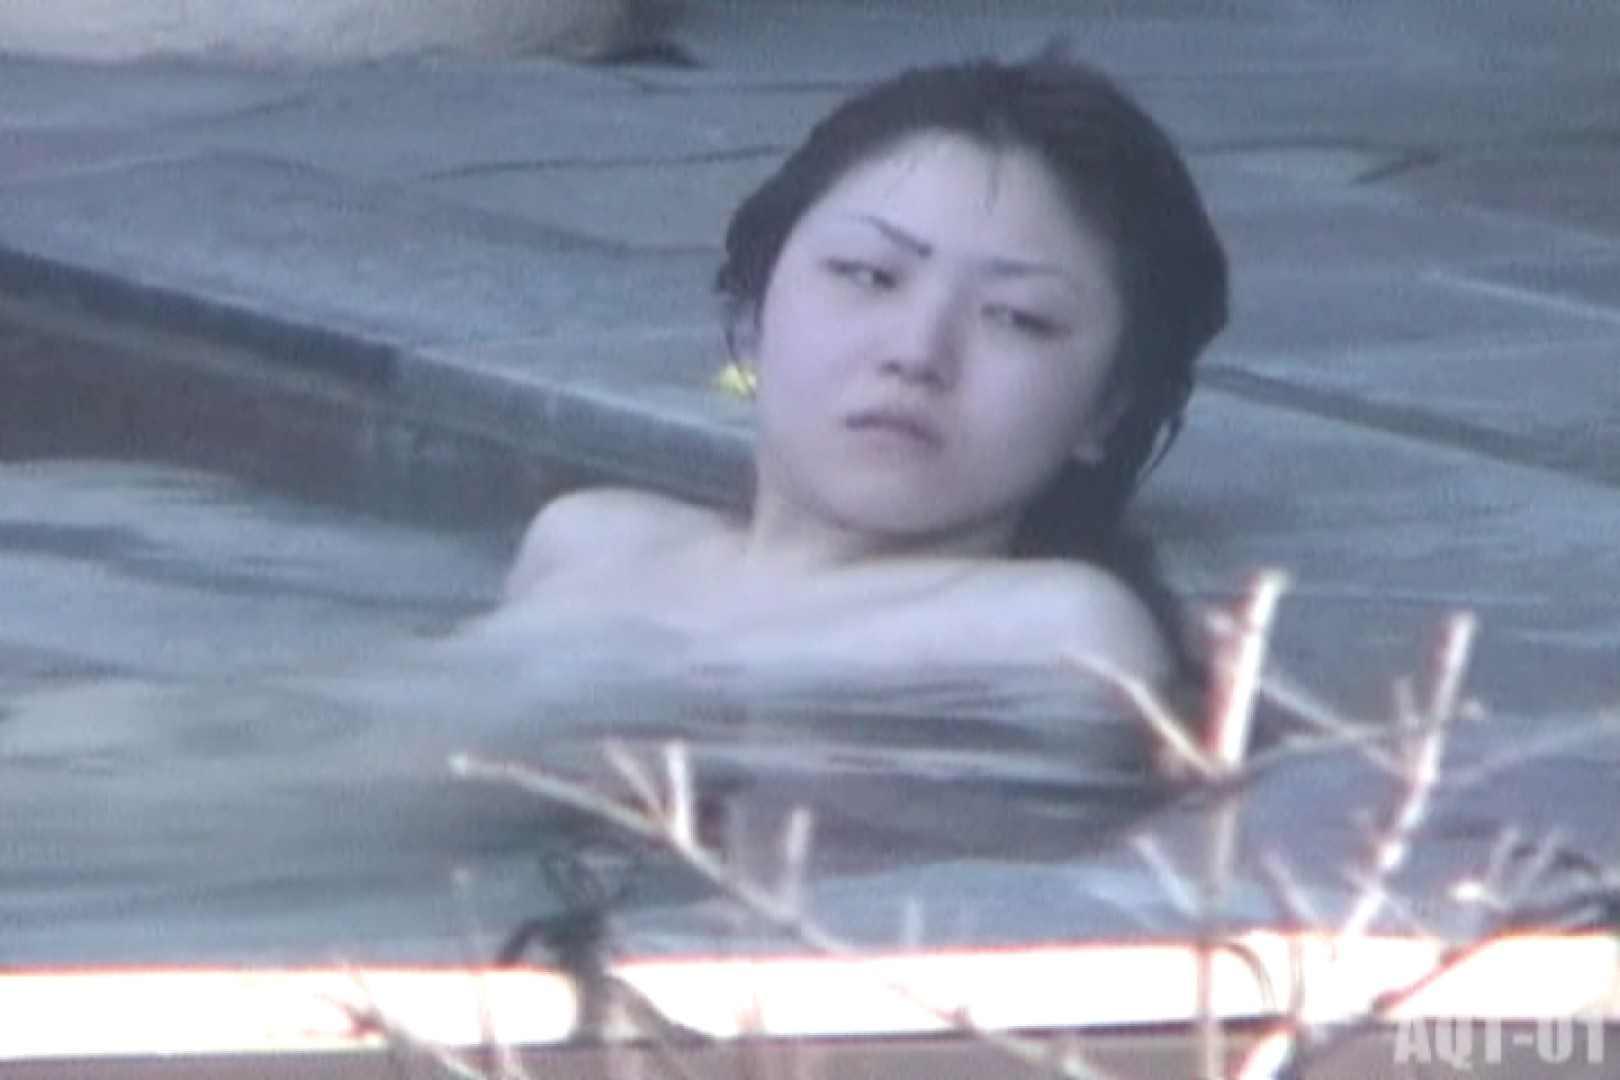 Aquaな露天風呂Vol.720 盗撮 | OLセックス  103画像 19